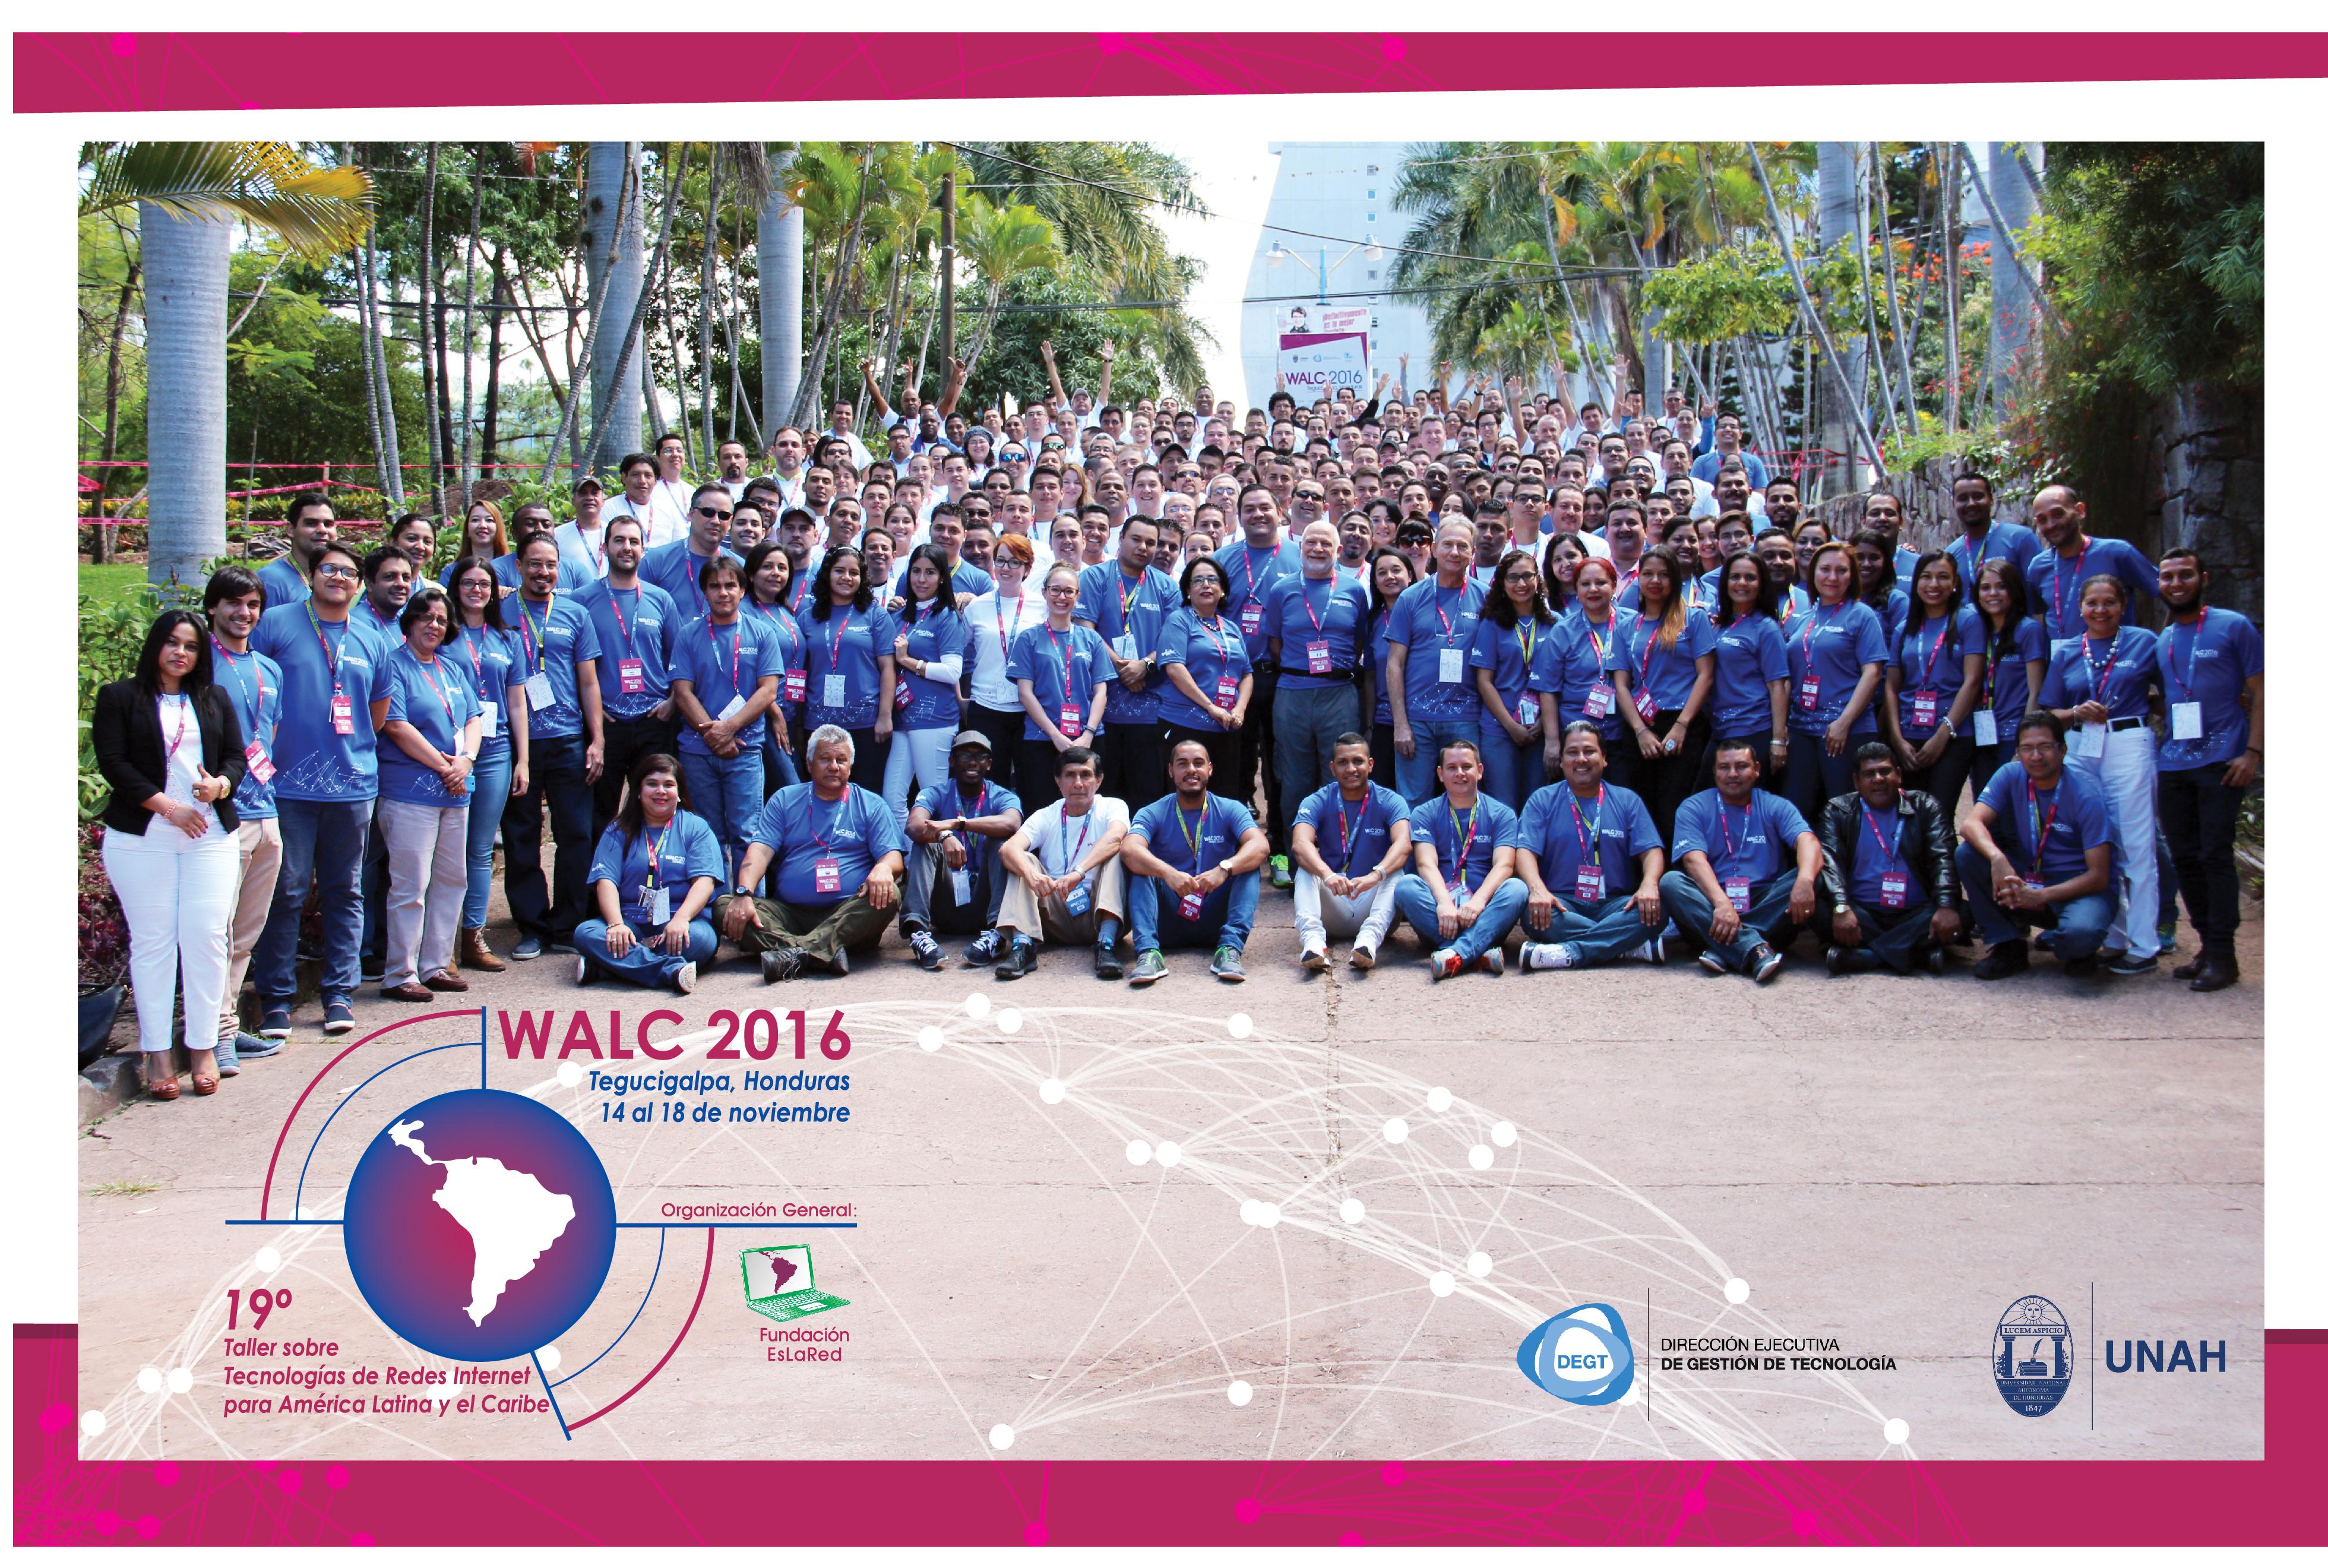 foto-grupal-WALC-2016